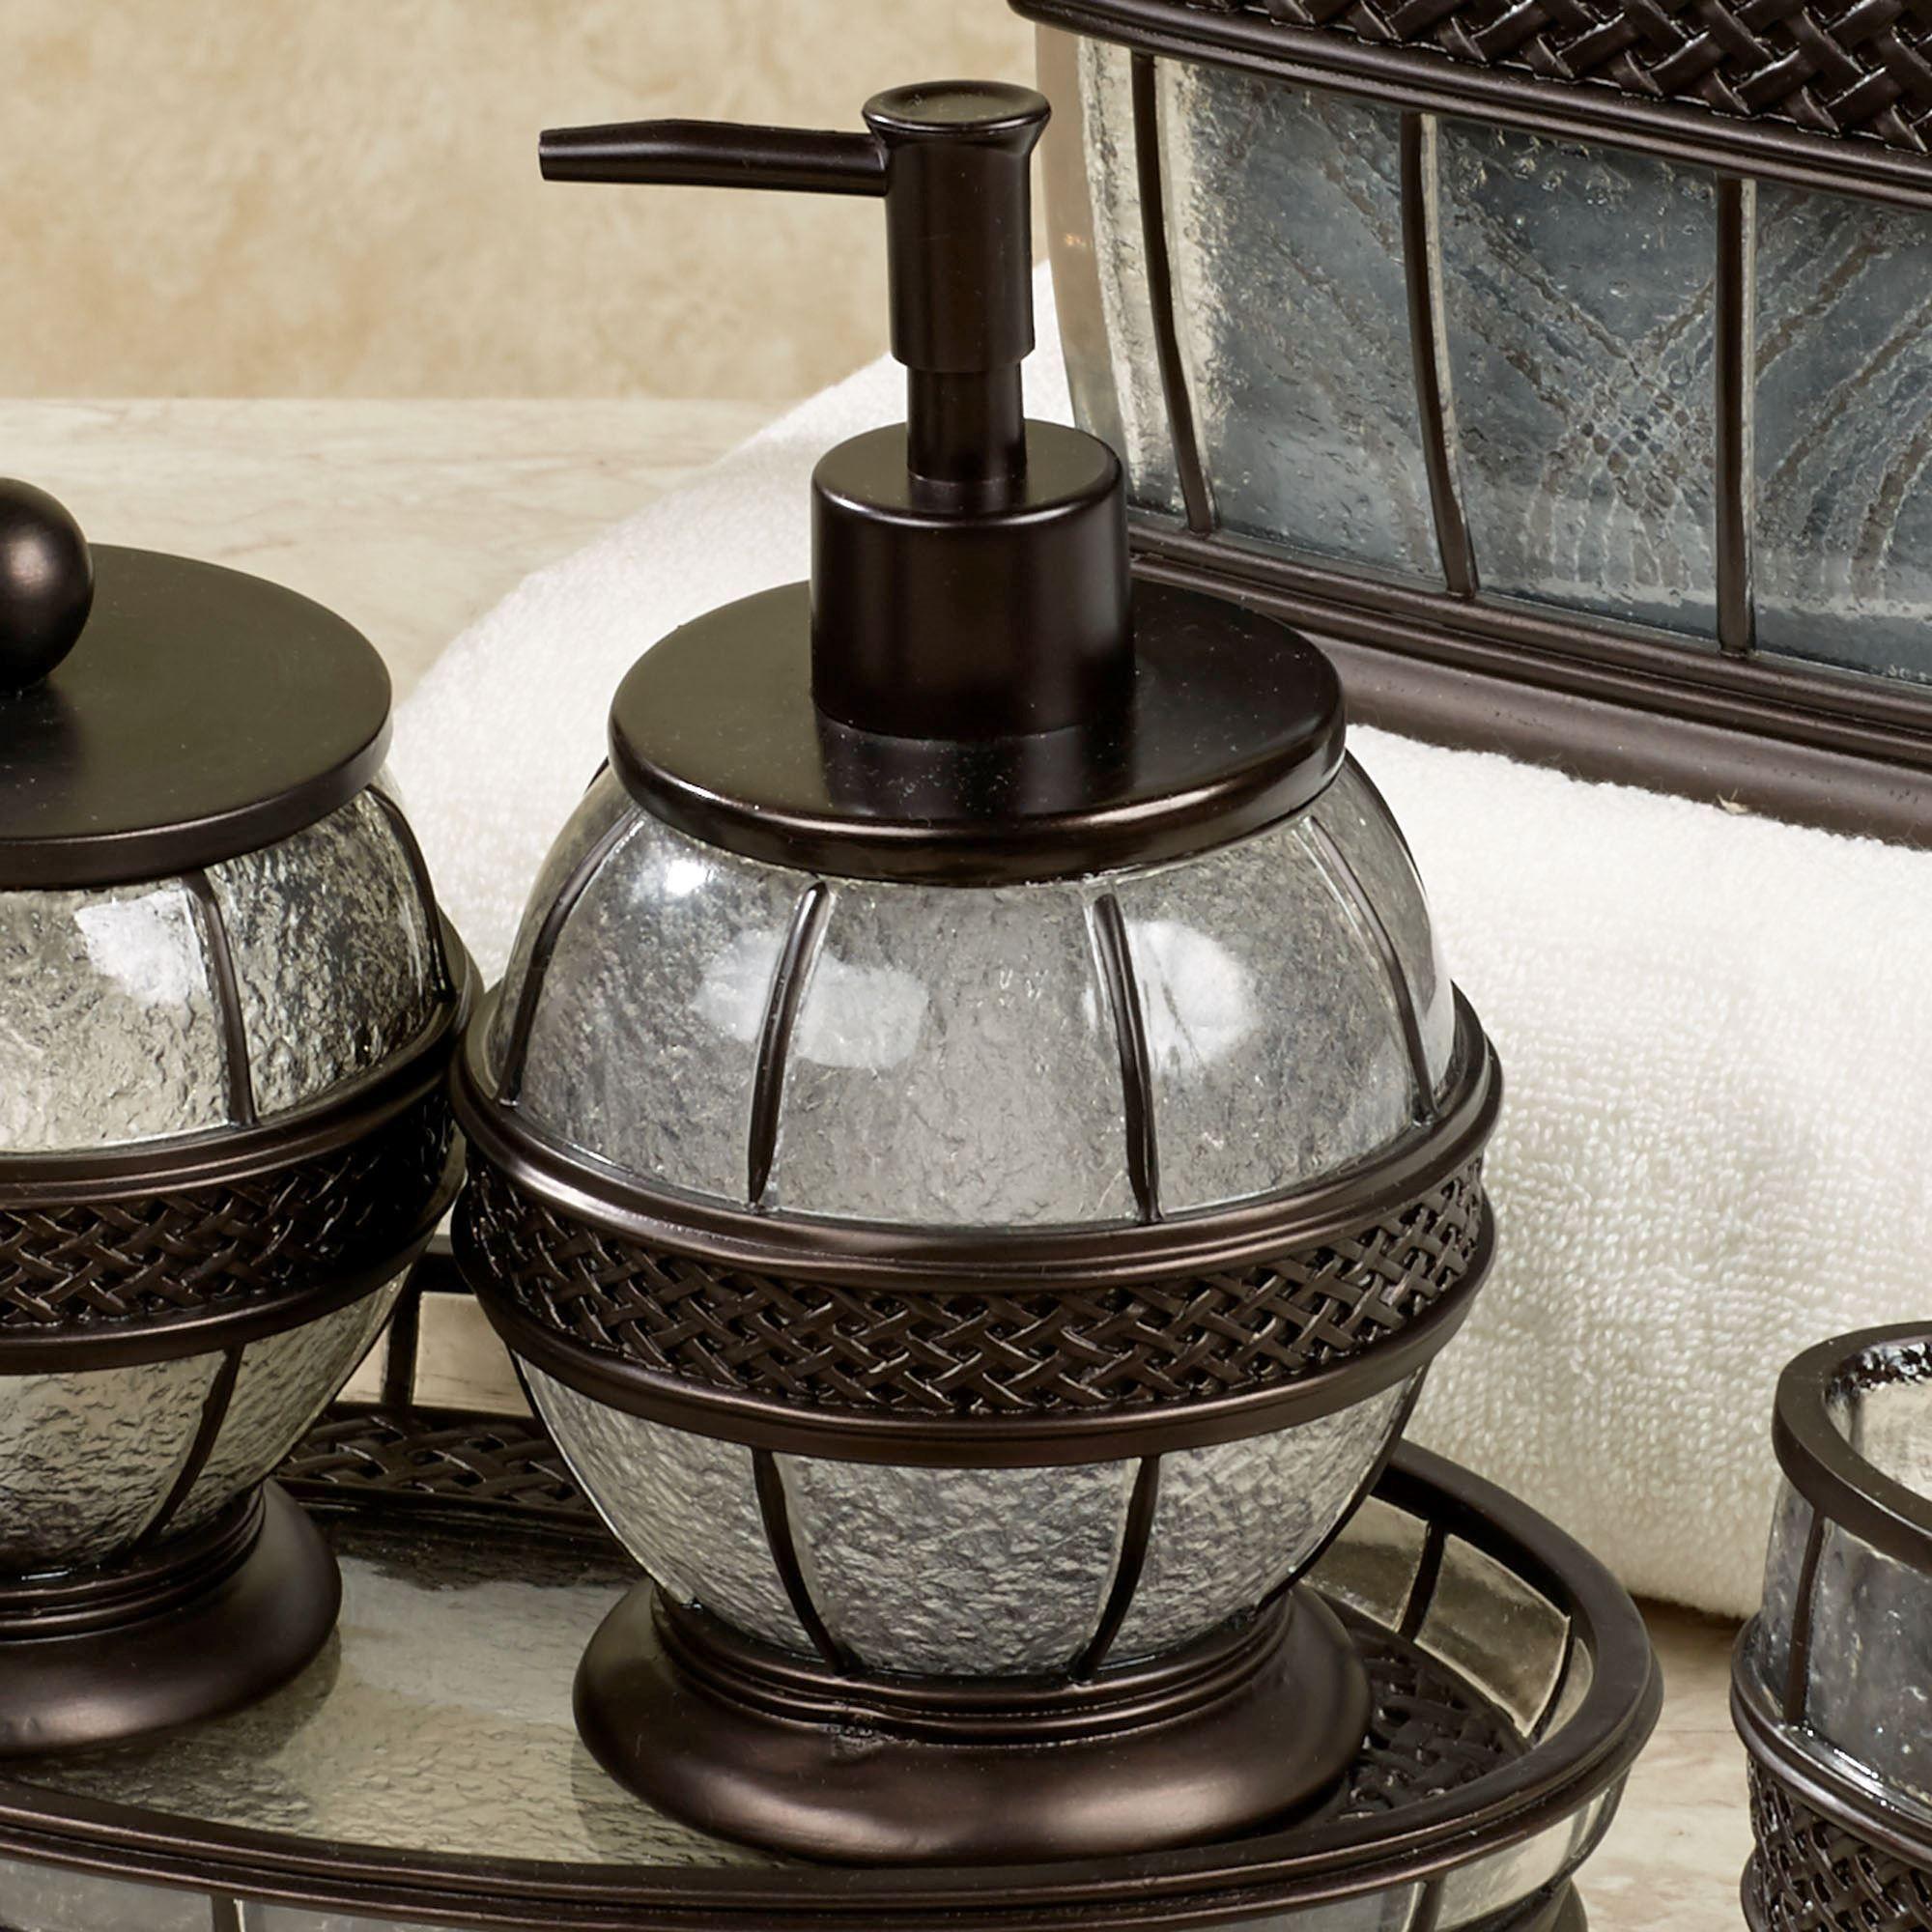 Ice Bath Accessories Bronze Bathroom Accessories Oil Rubbed Bronze Bathroom Accessories Bronze Bathroom